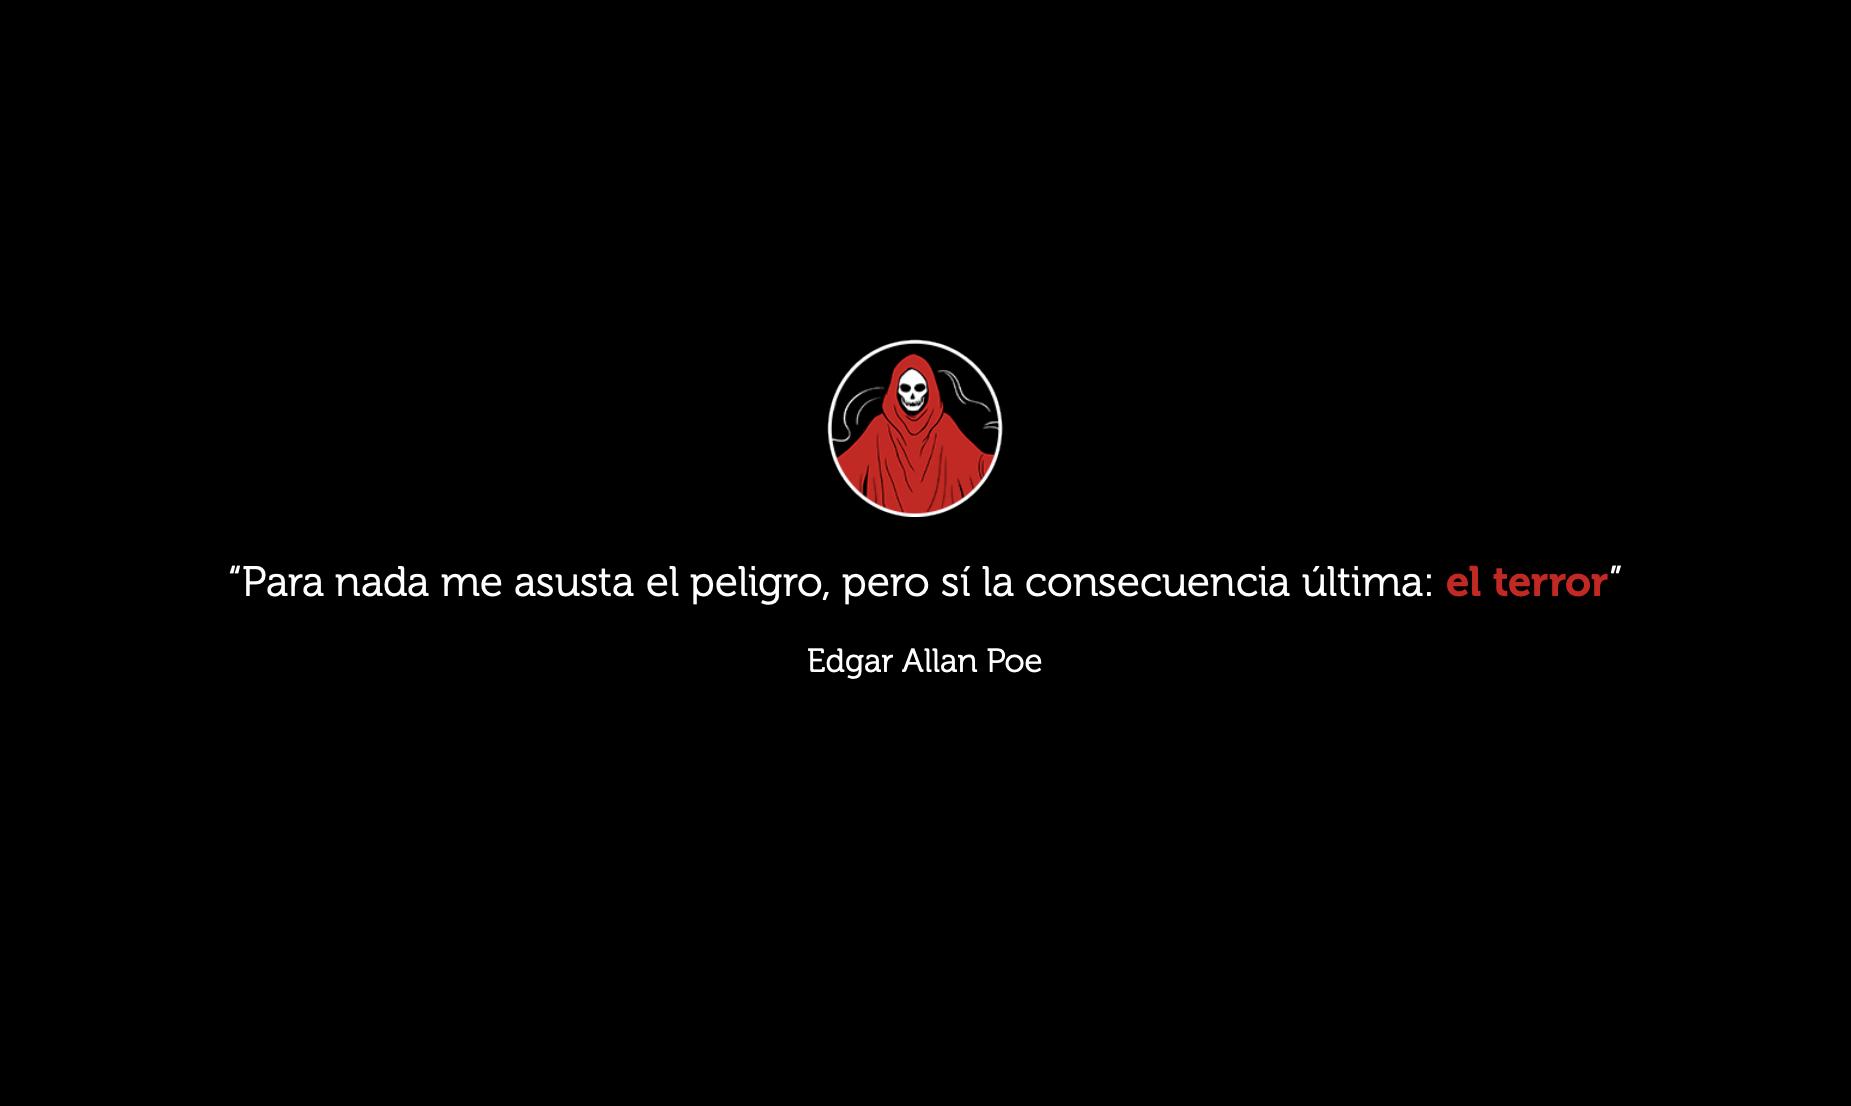 Allan Poe's Nightmare, Allan Poe, GAMETOPIA, Gametopia studios, tan grande y jugando, mobile game, ios game, ios, android game, android, literature game,